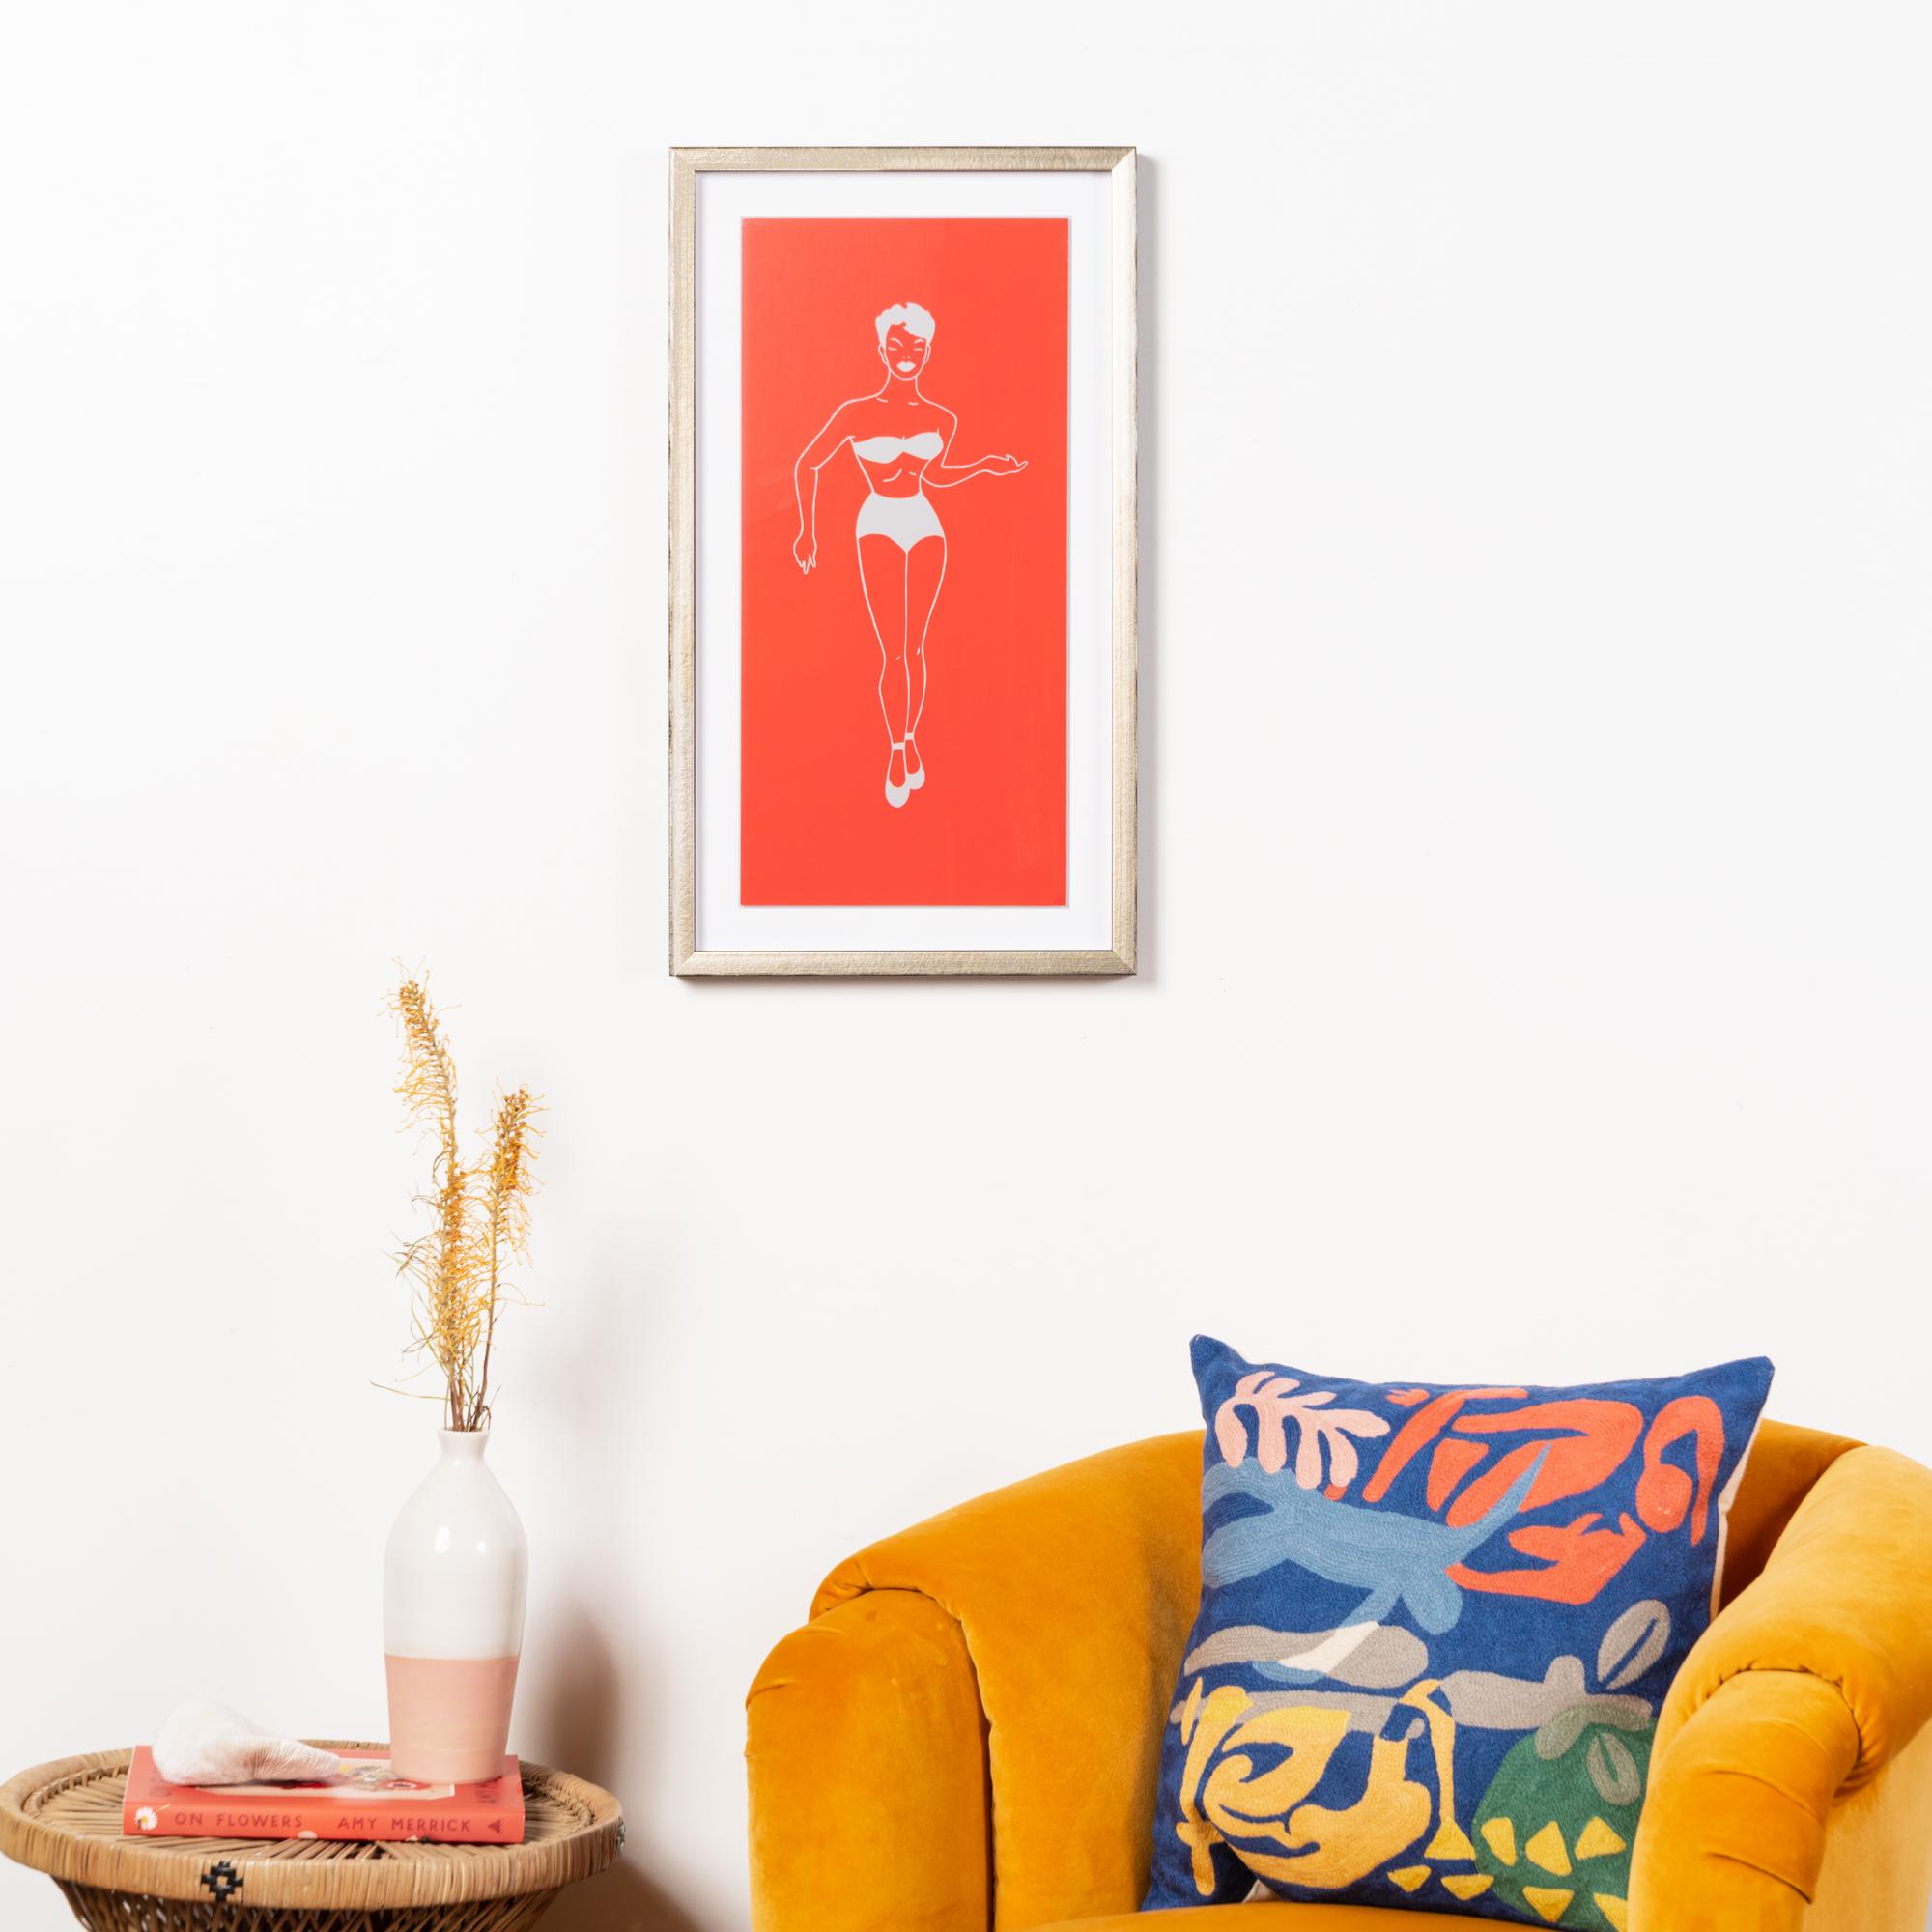 Framebridge Black Artists Print Shop Tracy Murrell Tangerine Torchy framed print Beverly frame